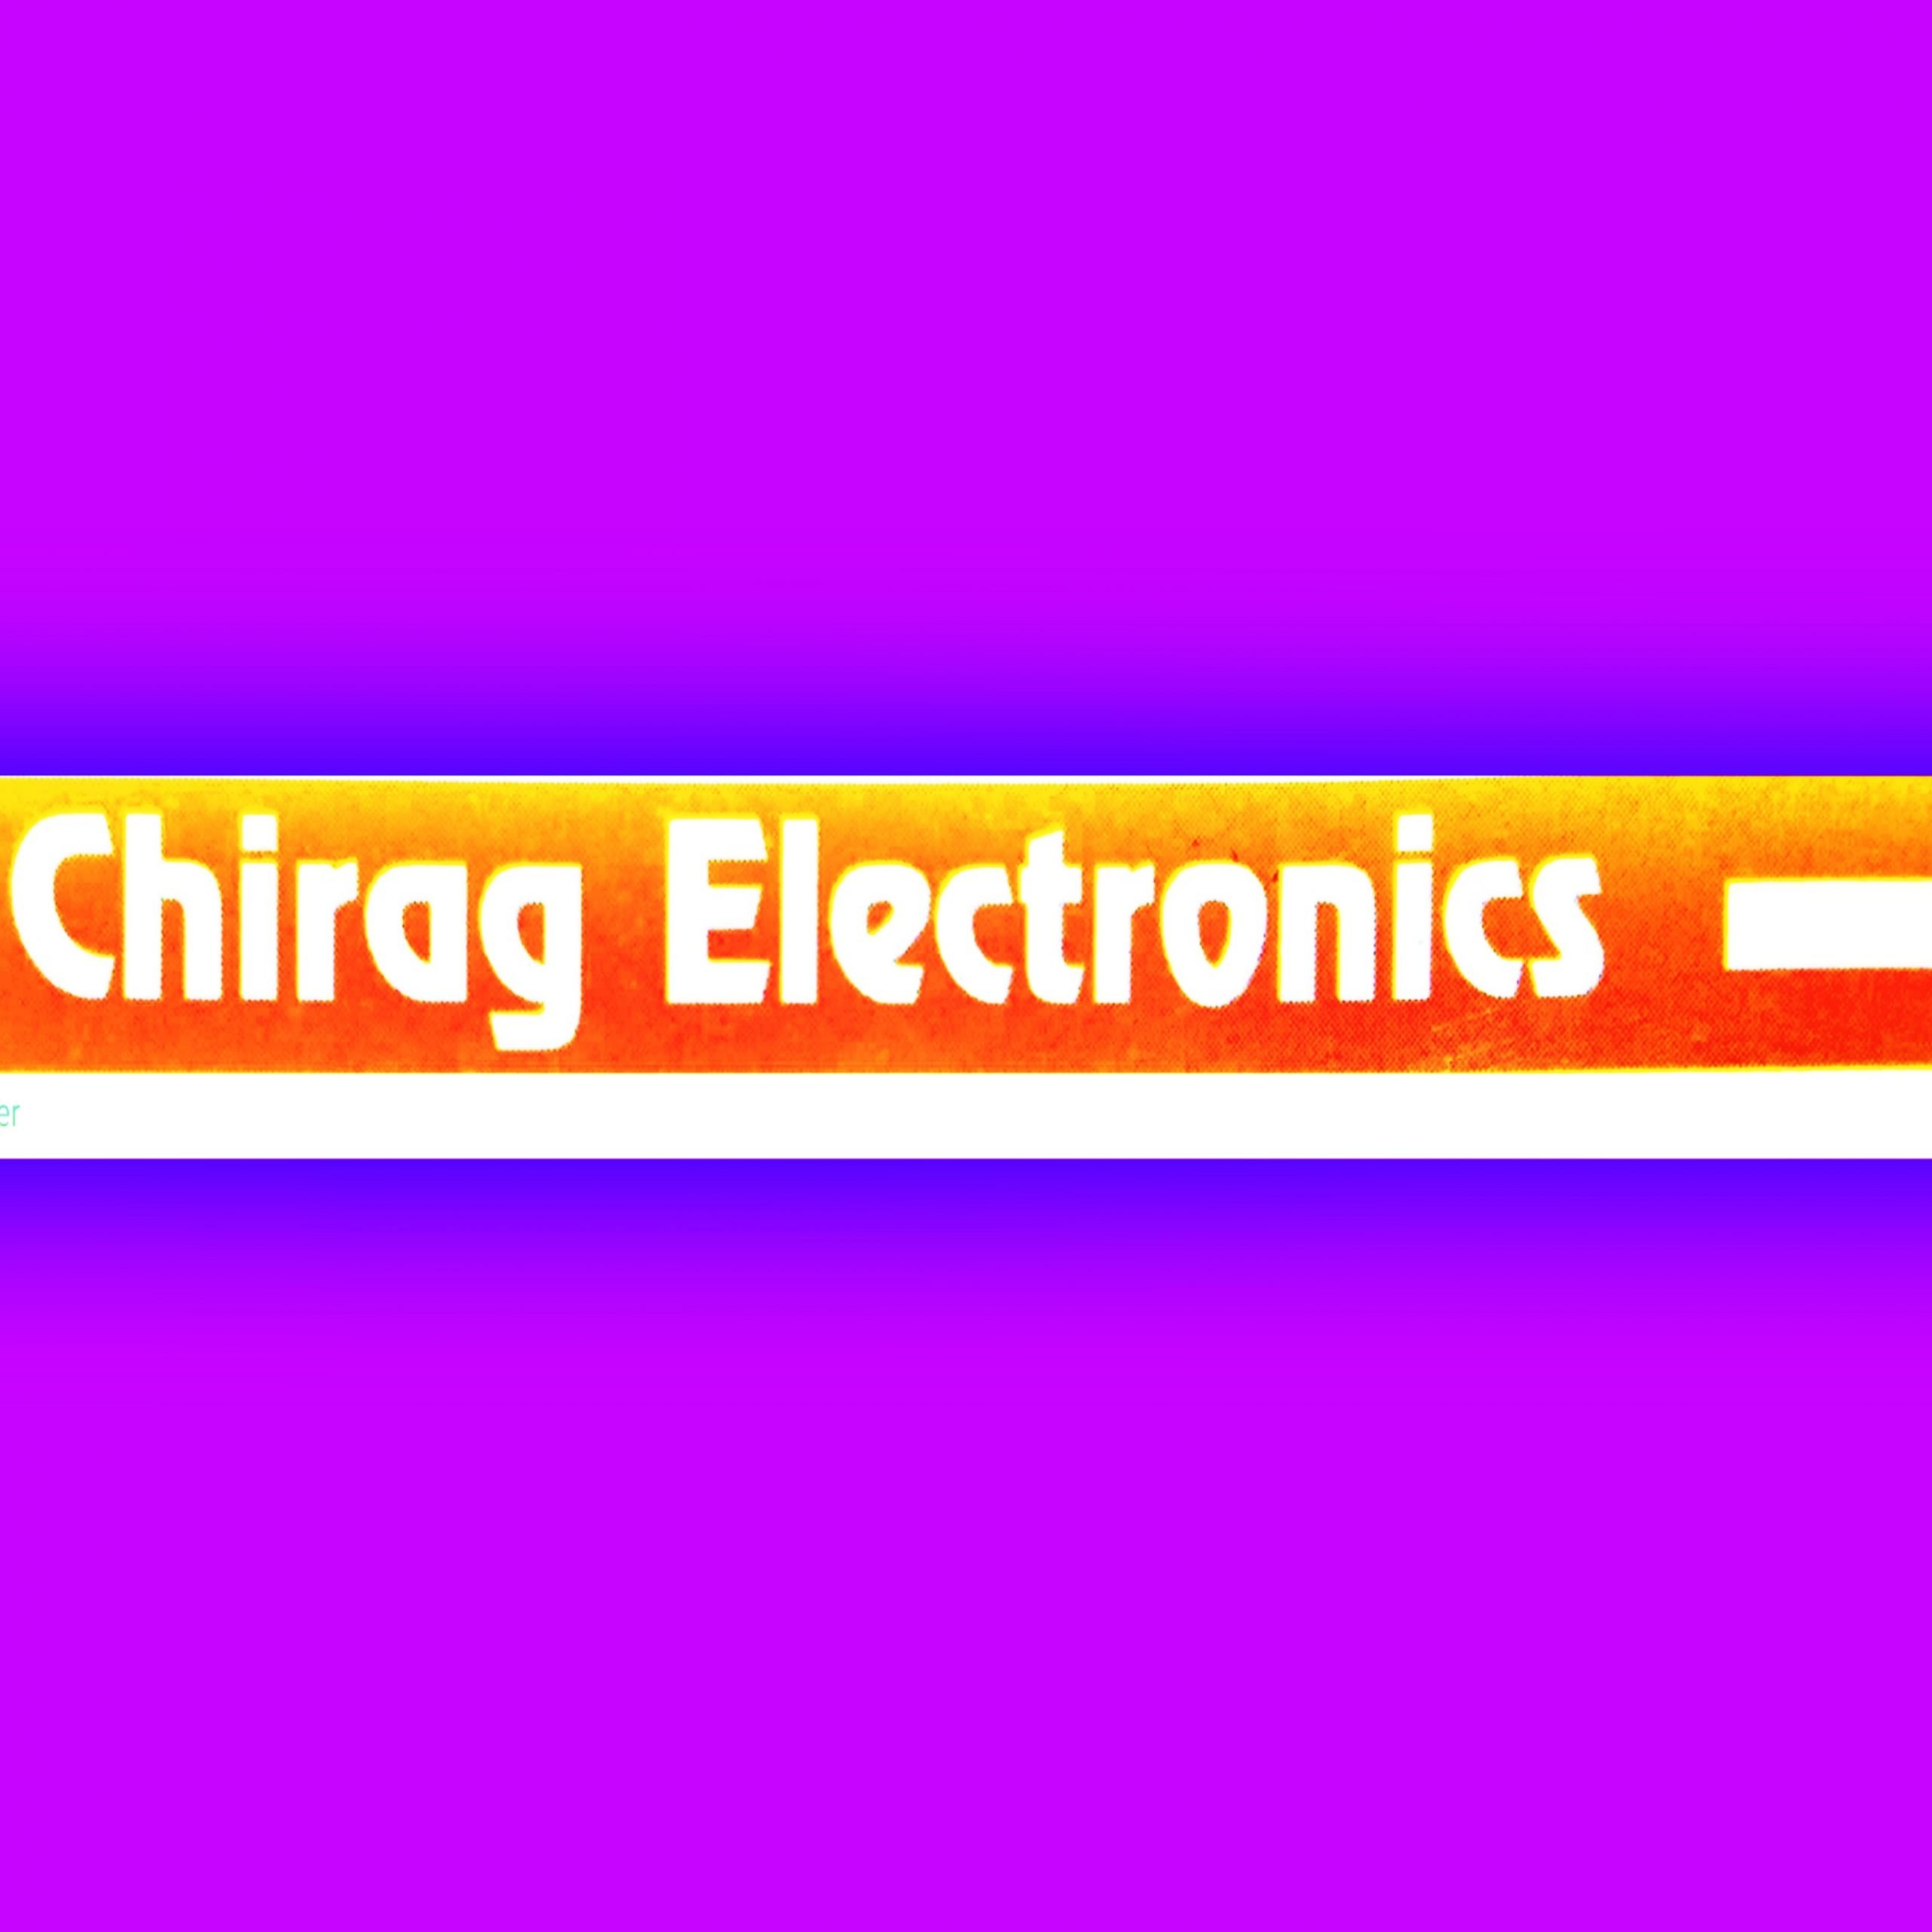 Chirag Electronics